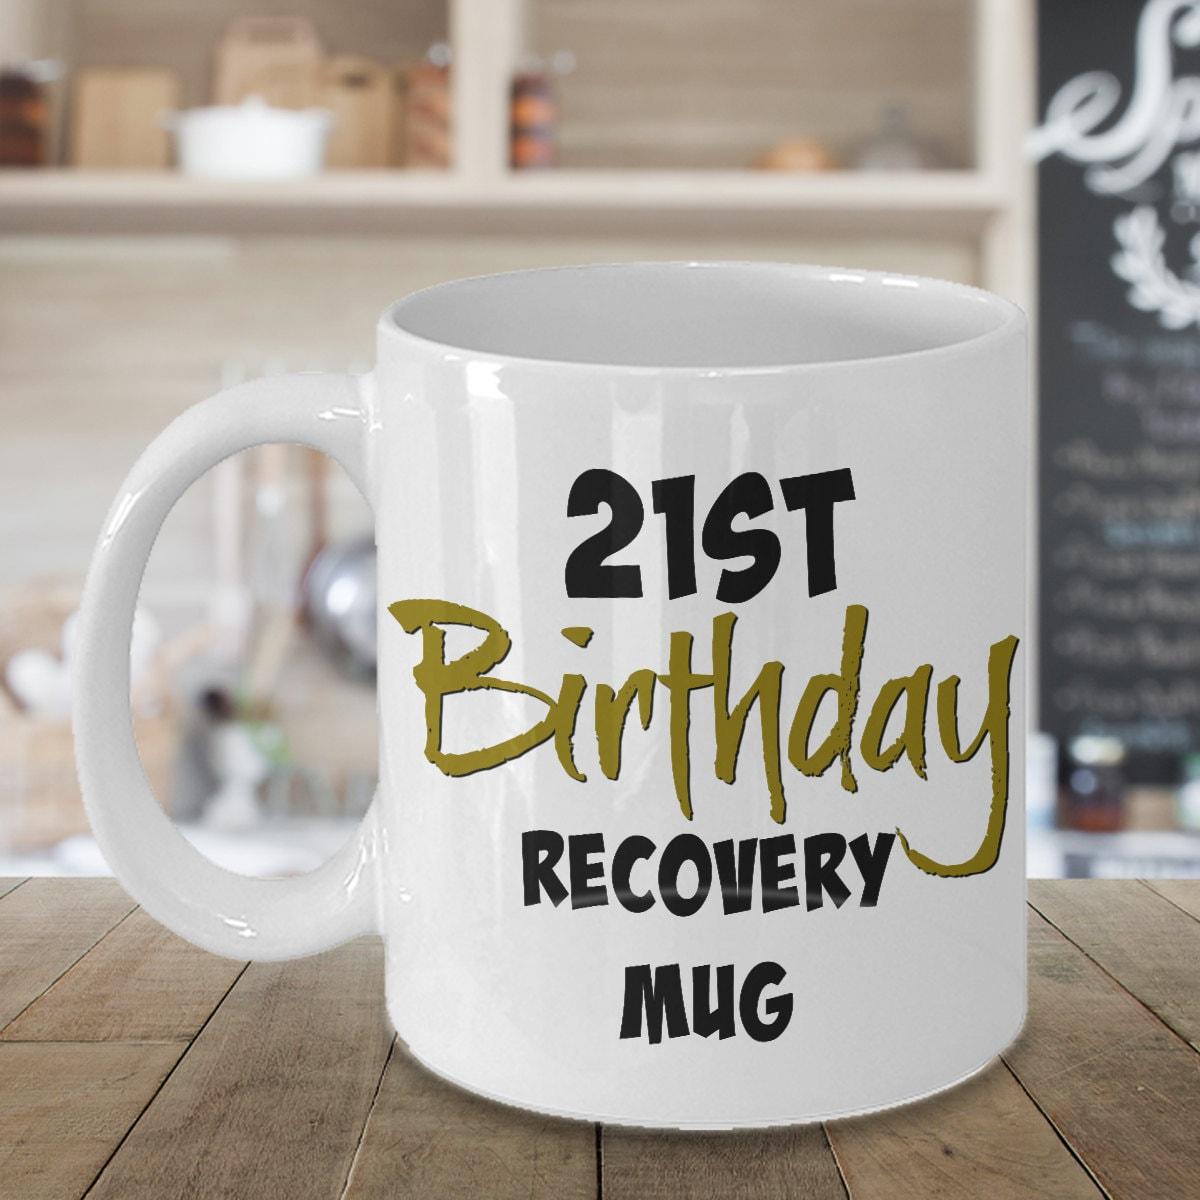 21st Birthday Recovery Mug 21st Birthday Mug 21st Birthday